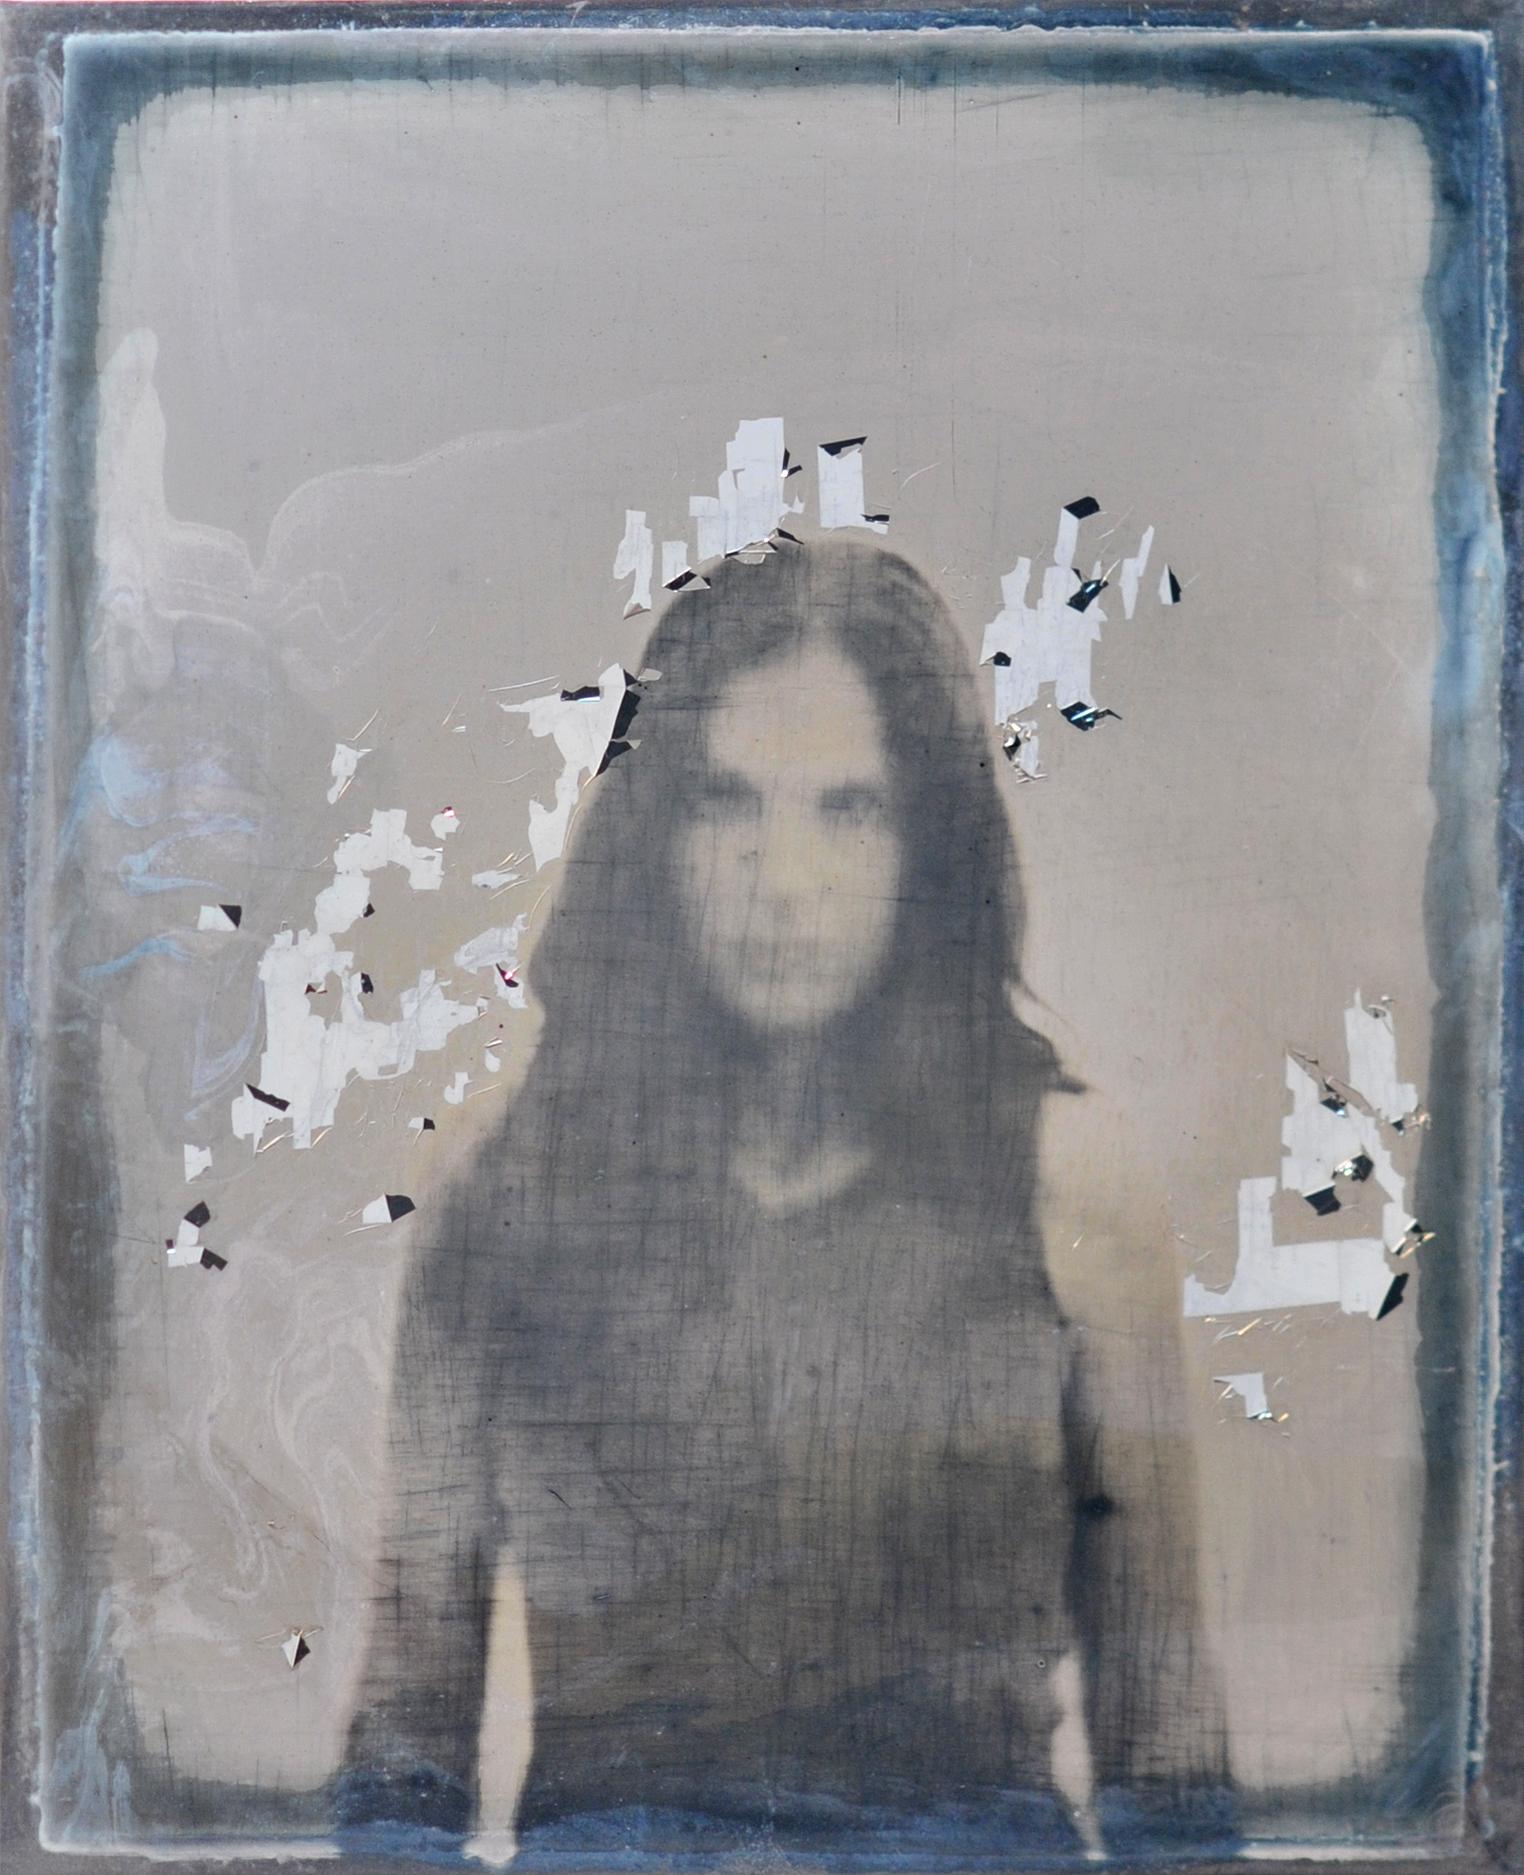 Self_Portarait_in_30_minutes,_Copper,_Silver,_Gold_(Daguerreotype),_11x9_cm,_2011.JPG